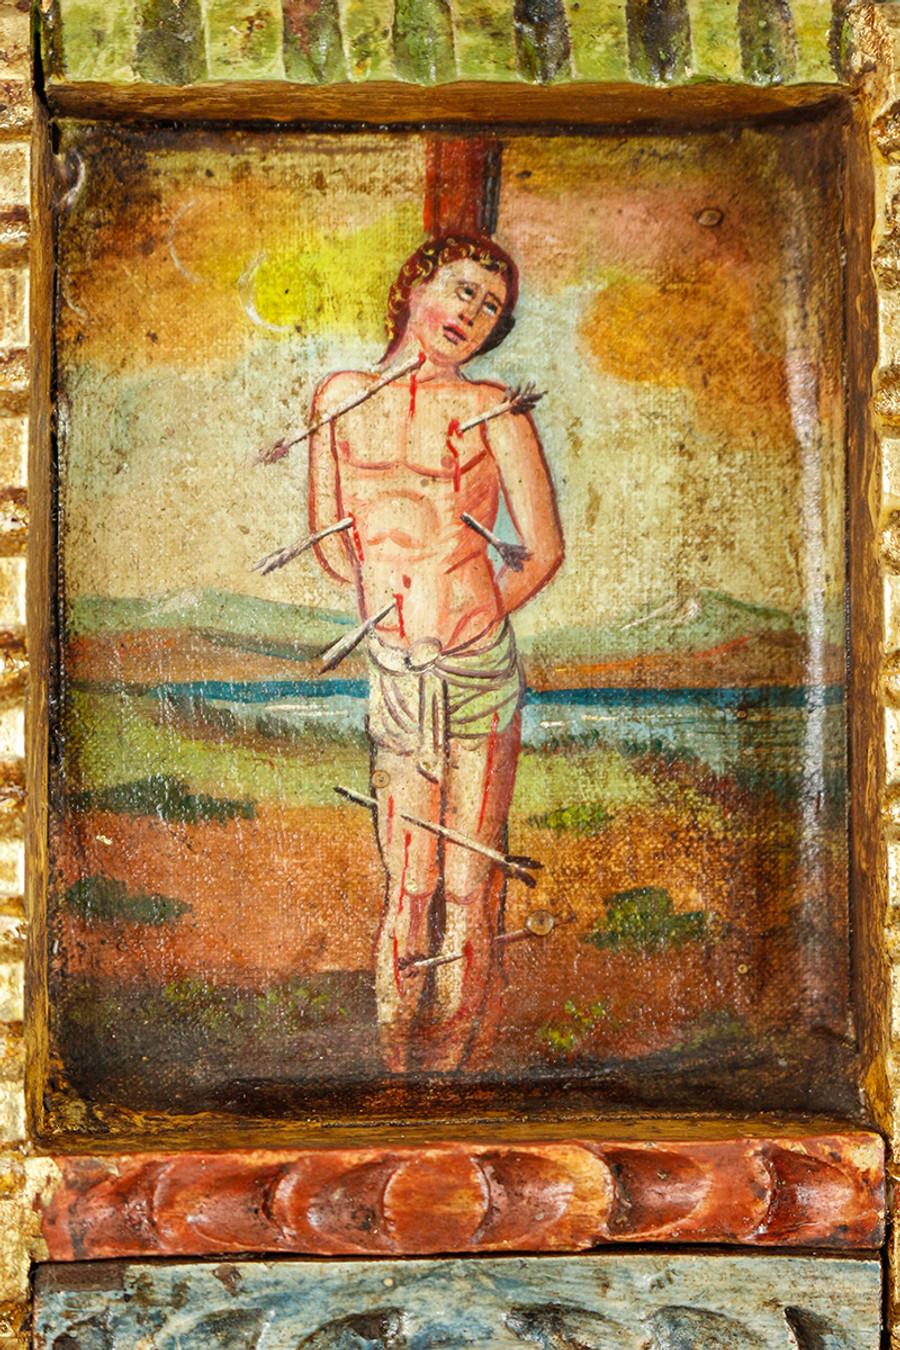 Saint Sebastian Colonial Peru Art Handmade Retablo Handcarved Altarpiece (71-100-04429)